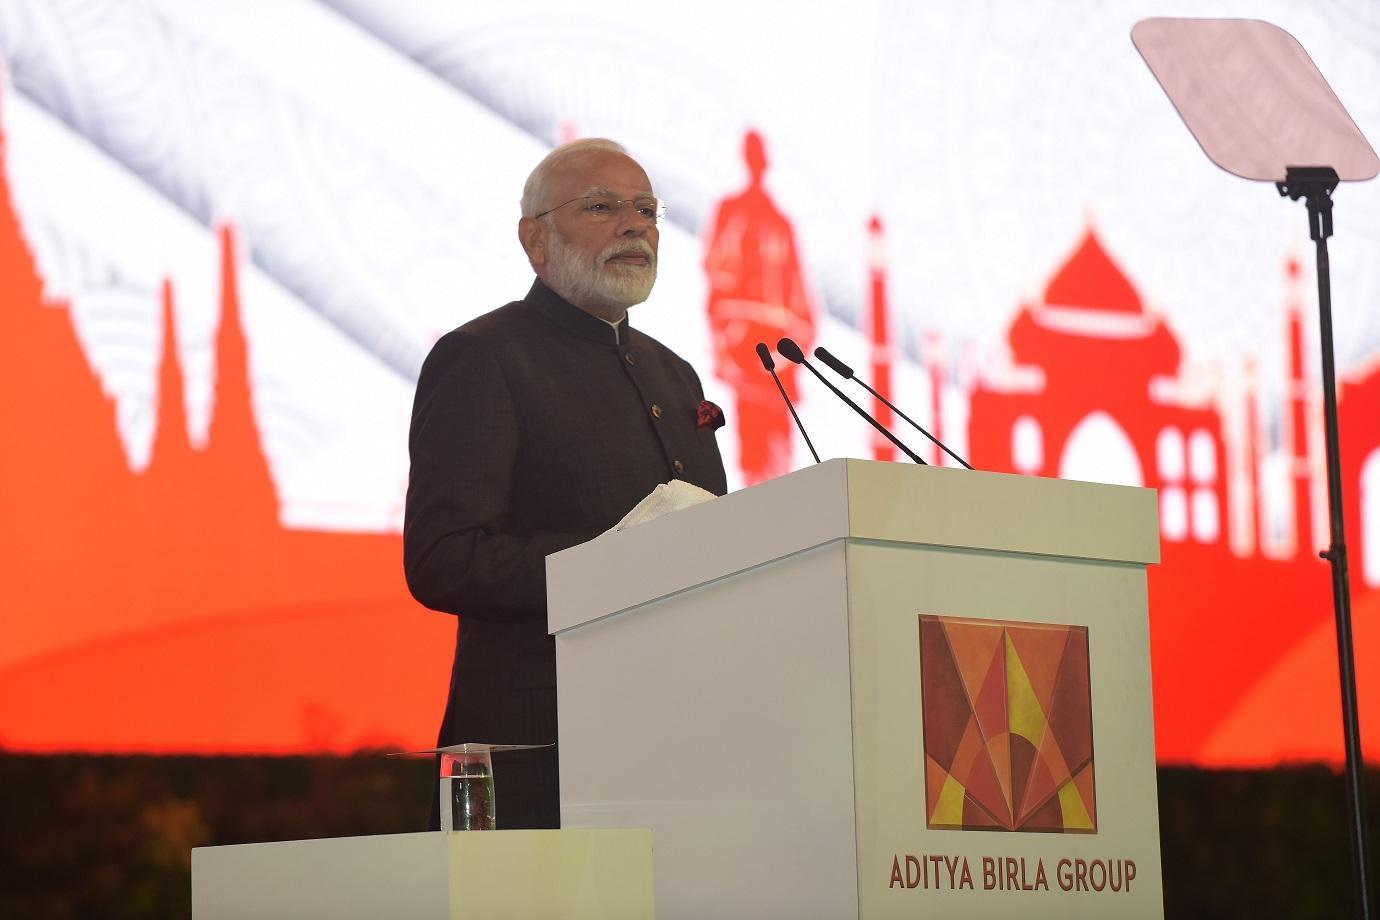 Aditya Birla celebrates 50th year with PM Modi